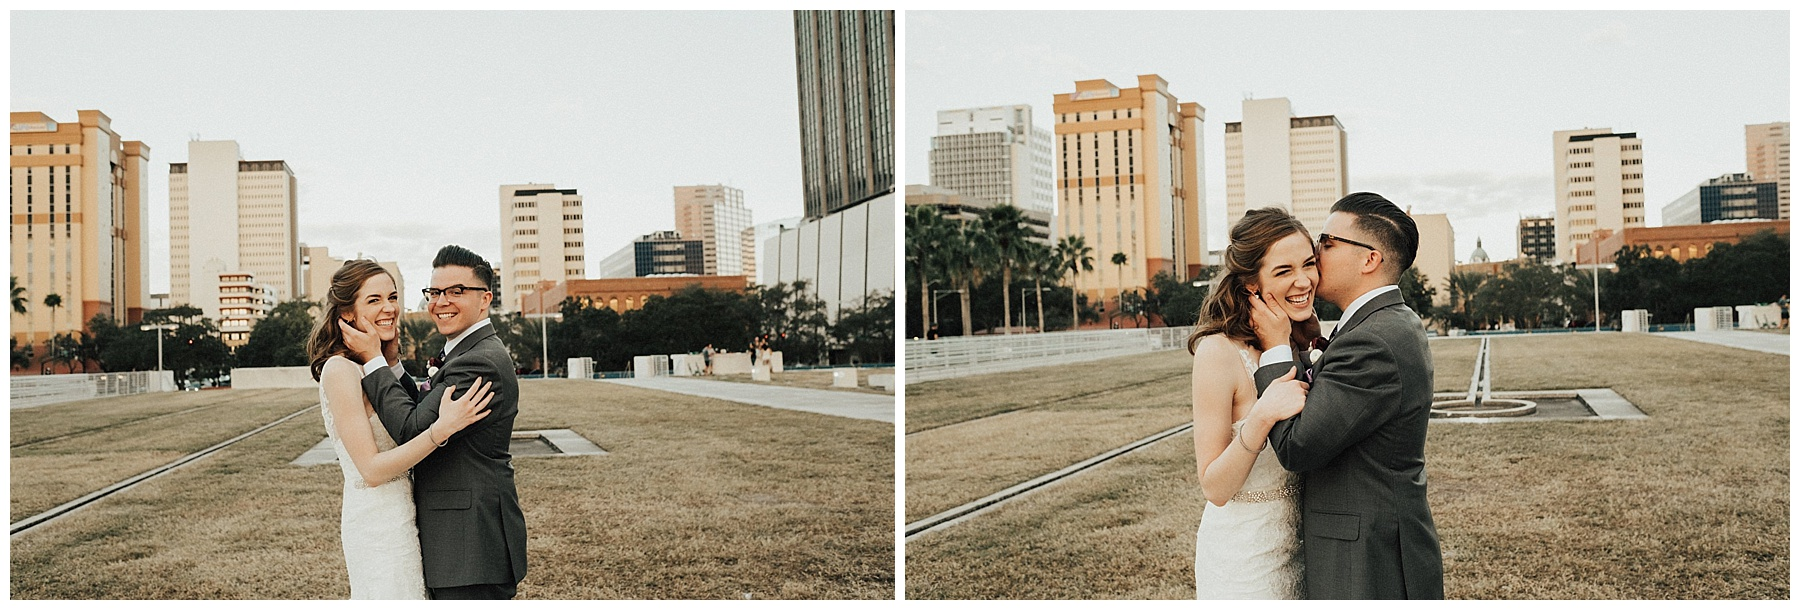 Kylie Garden Wedding Tampa Wedding Photographer-97.jpg